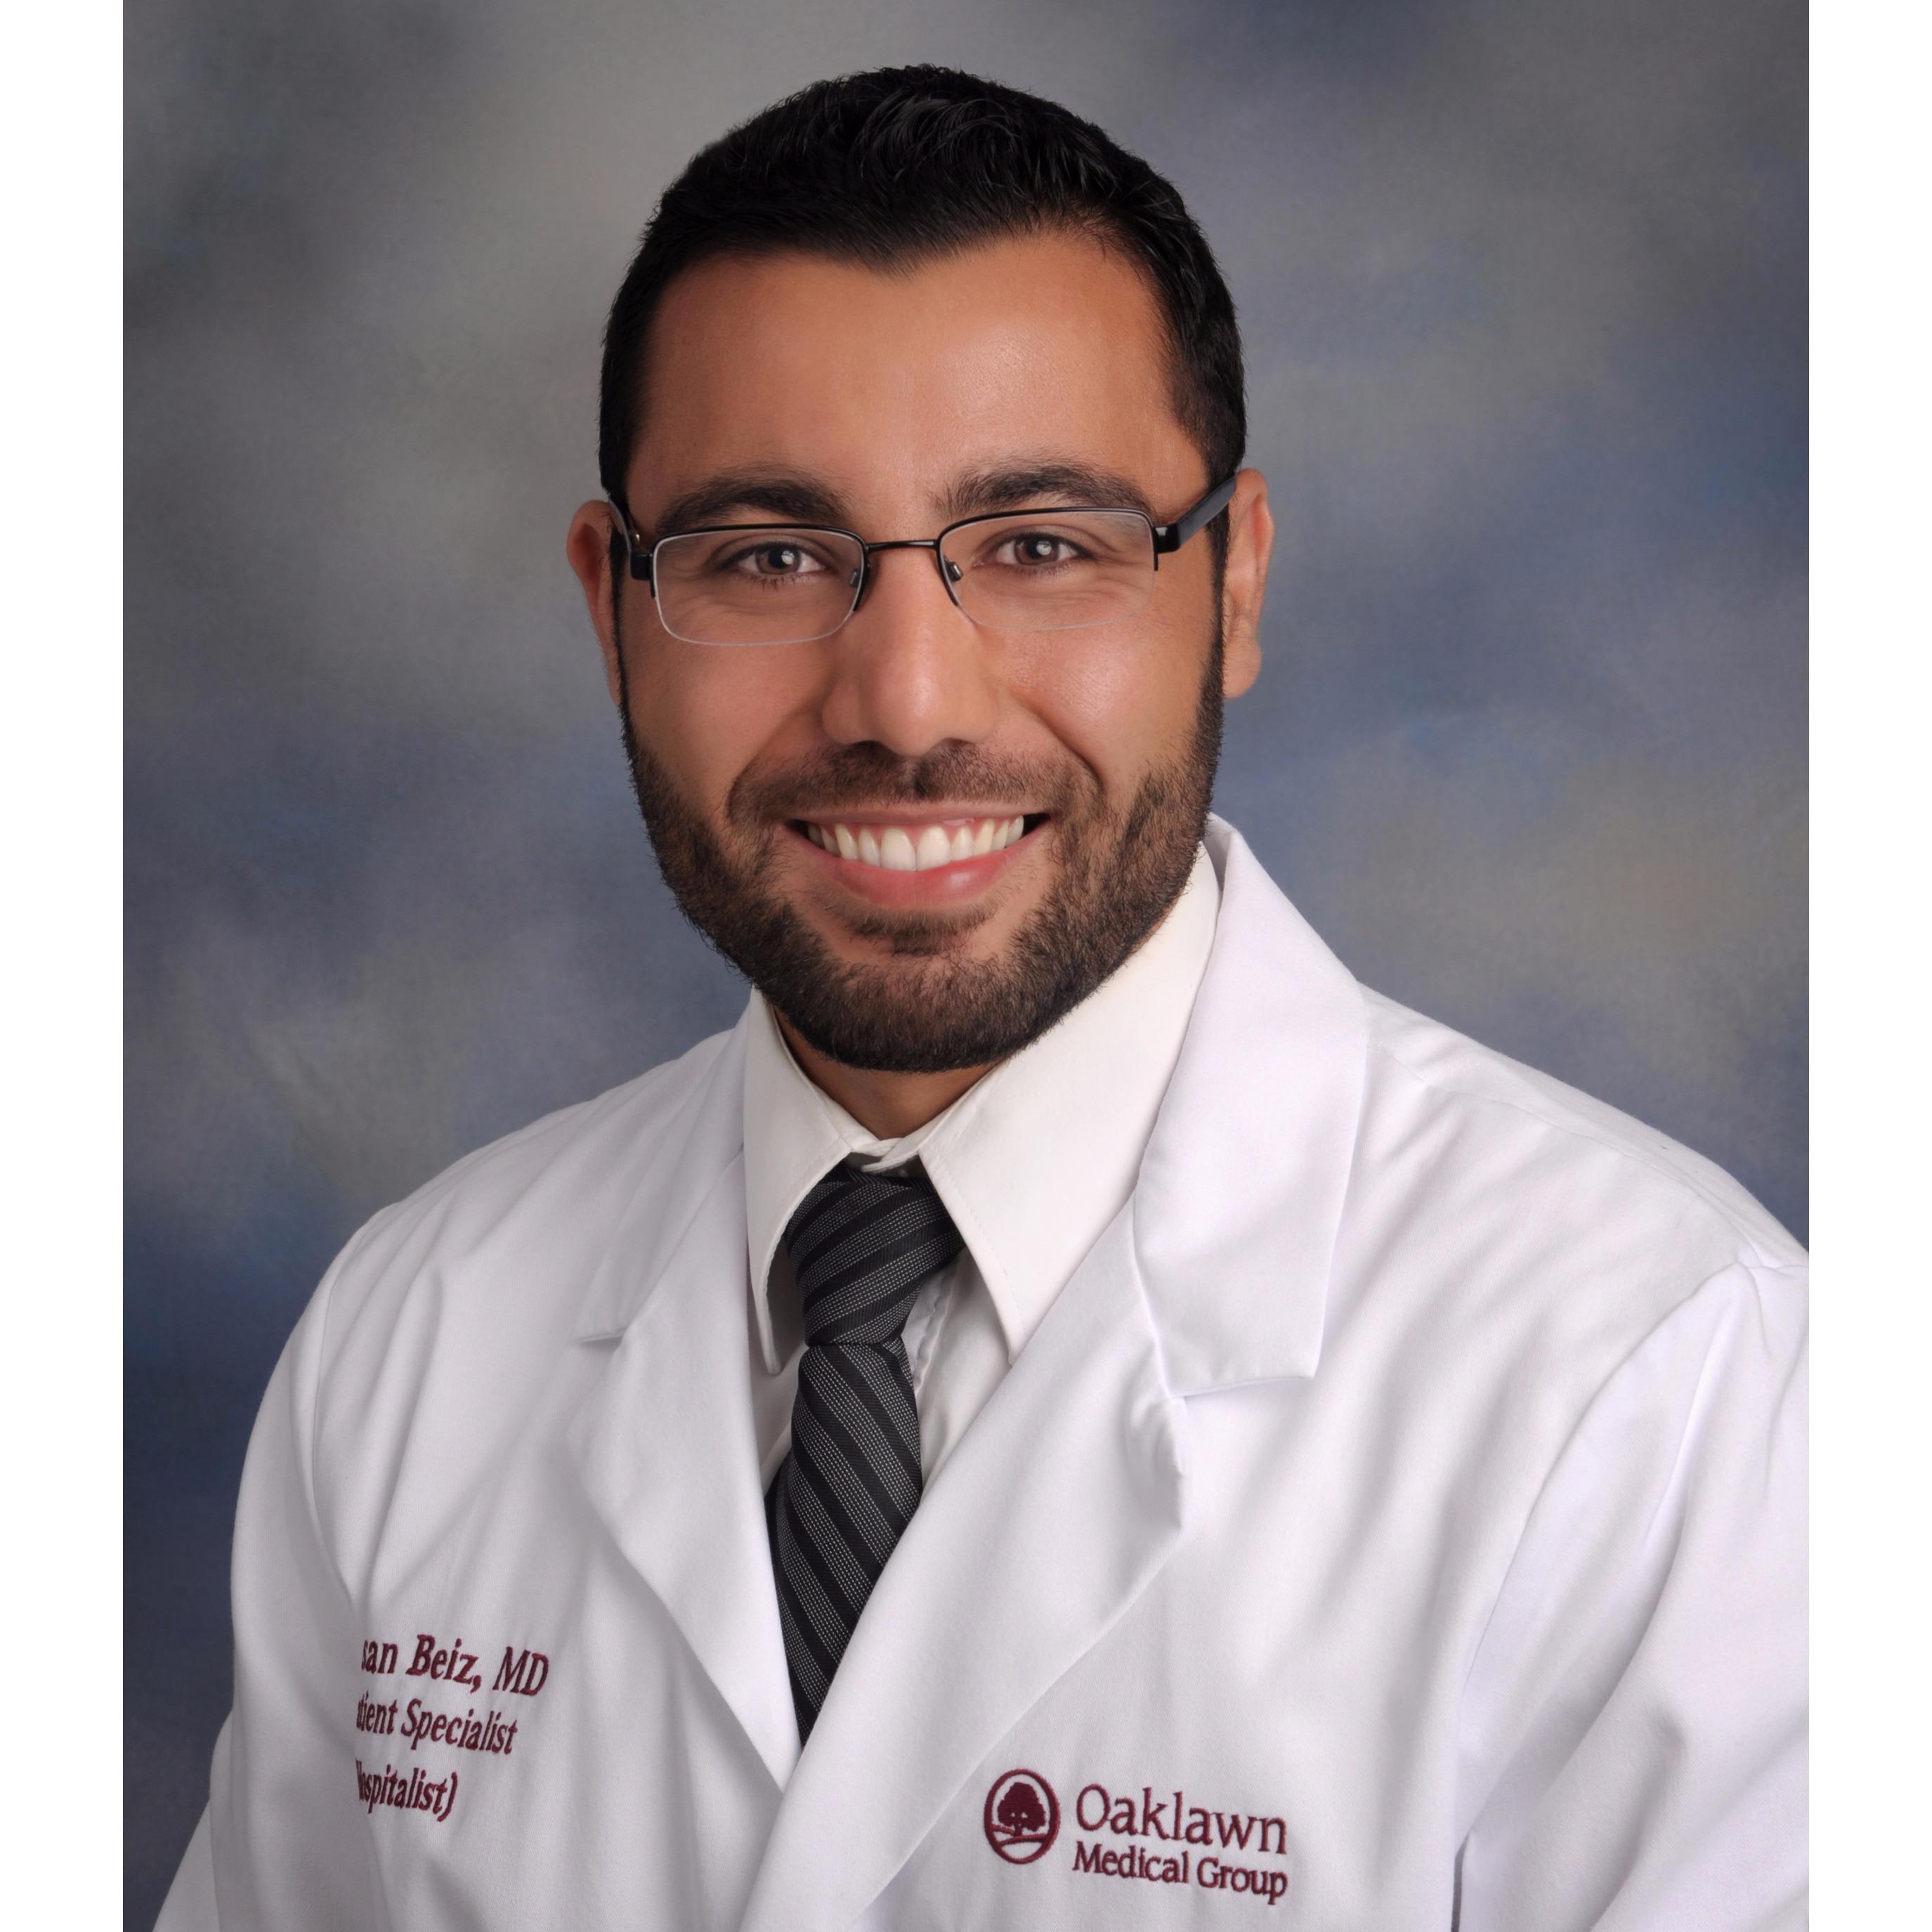 Dr. Hassan H Beiz MD